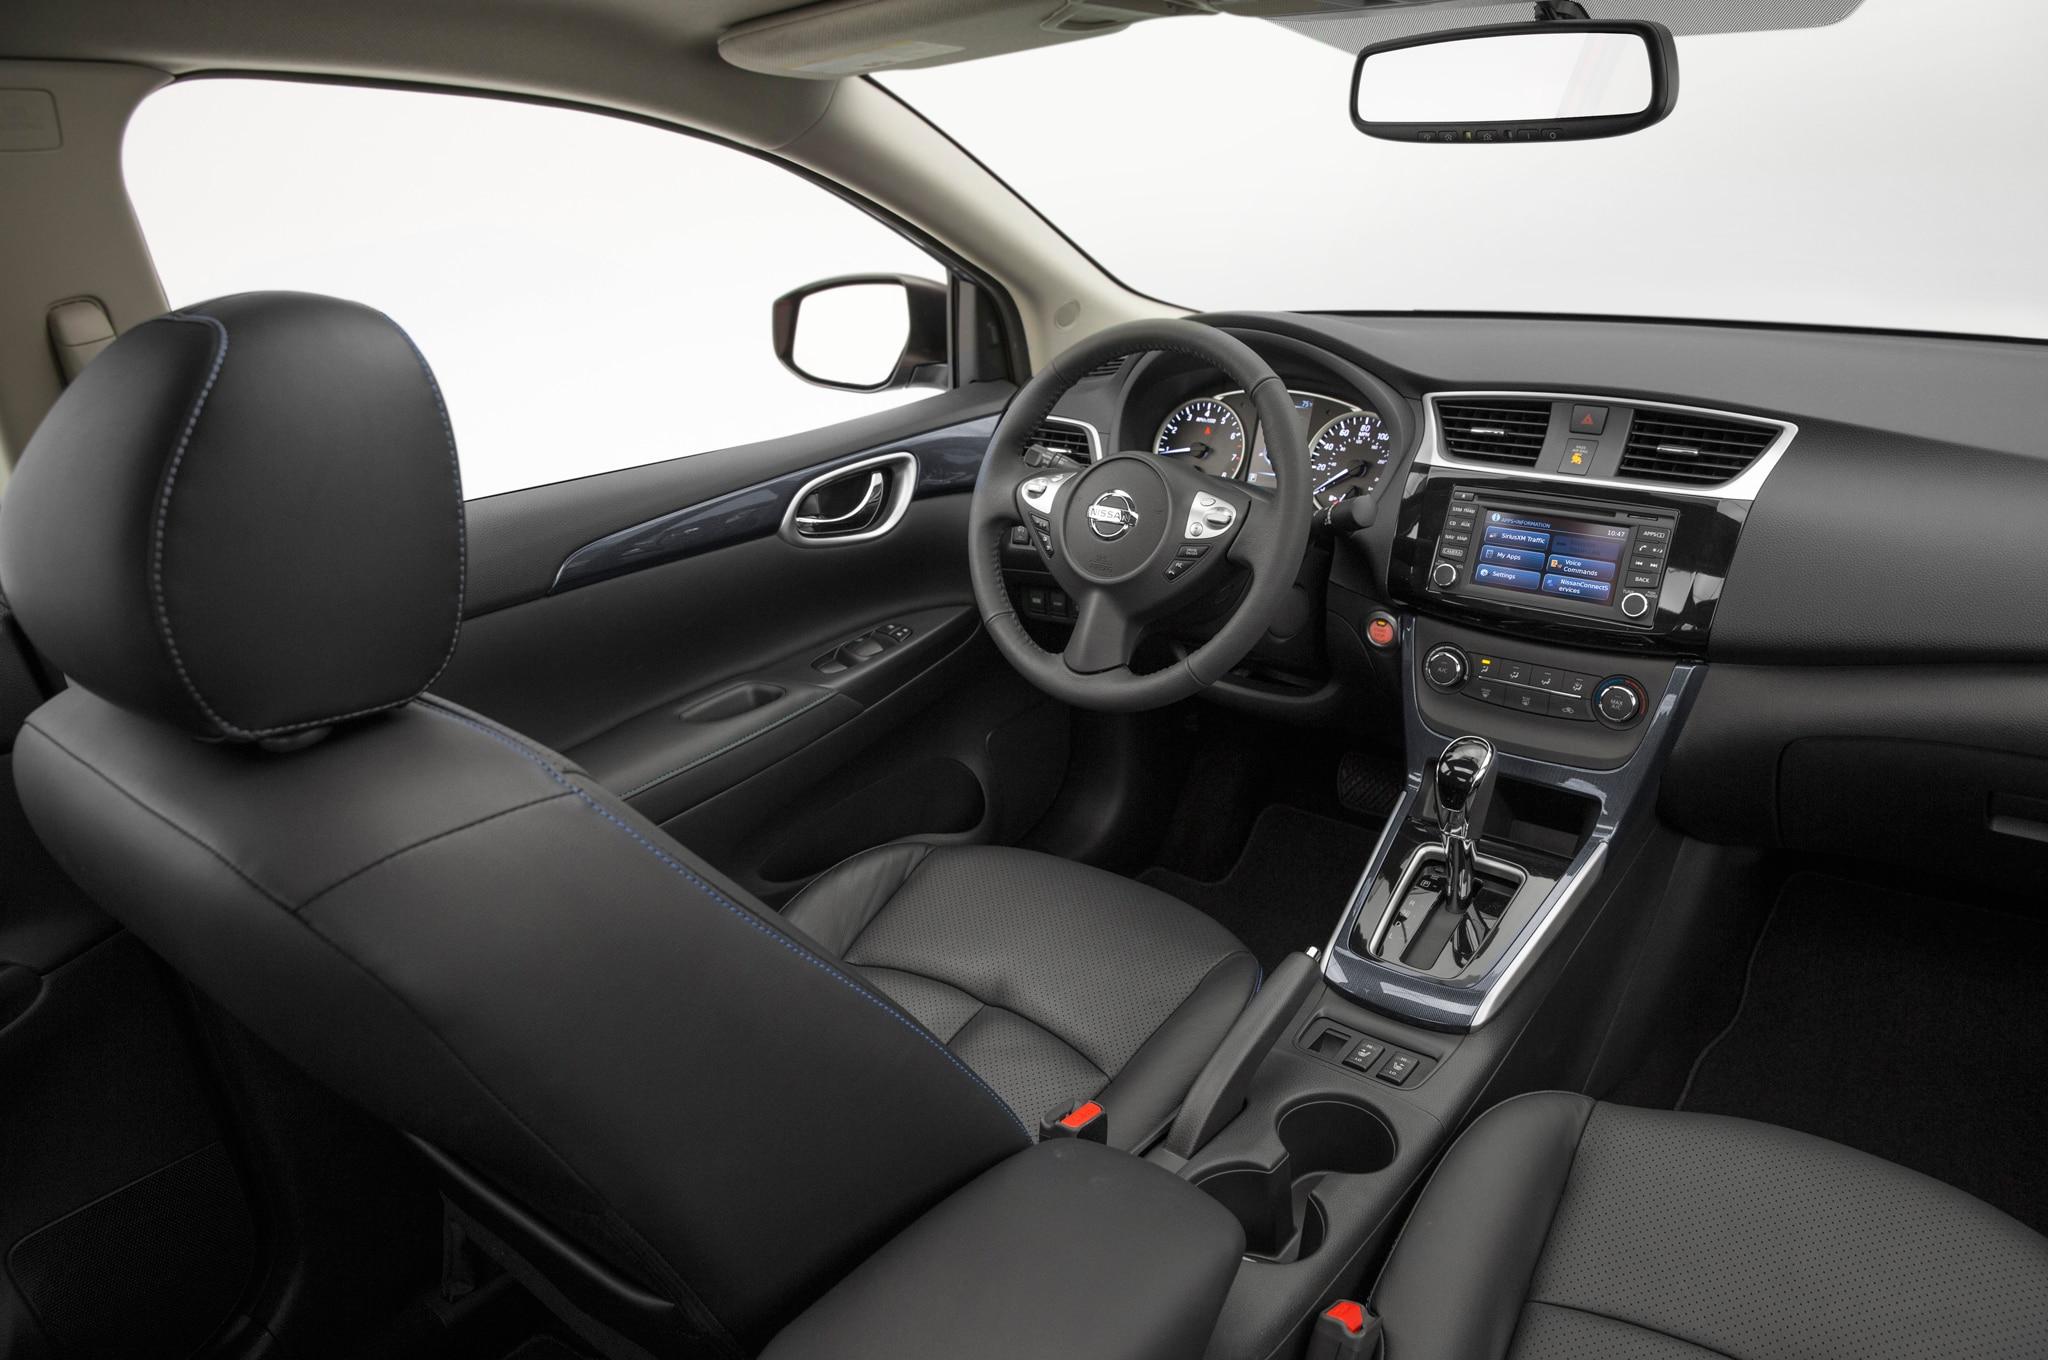 2016 Nissan Sentra Sv >> 2016 Nissan Sentra Review